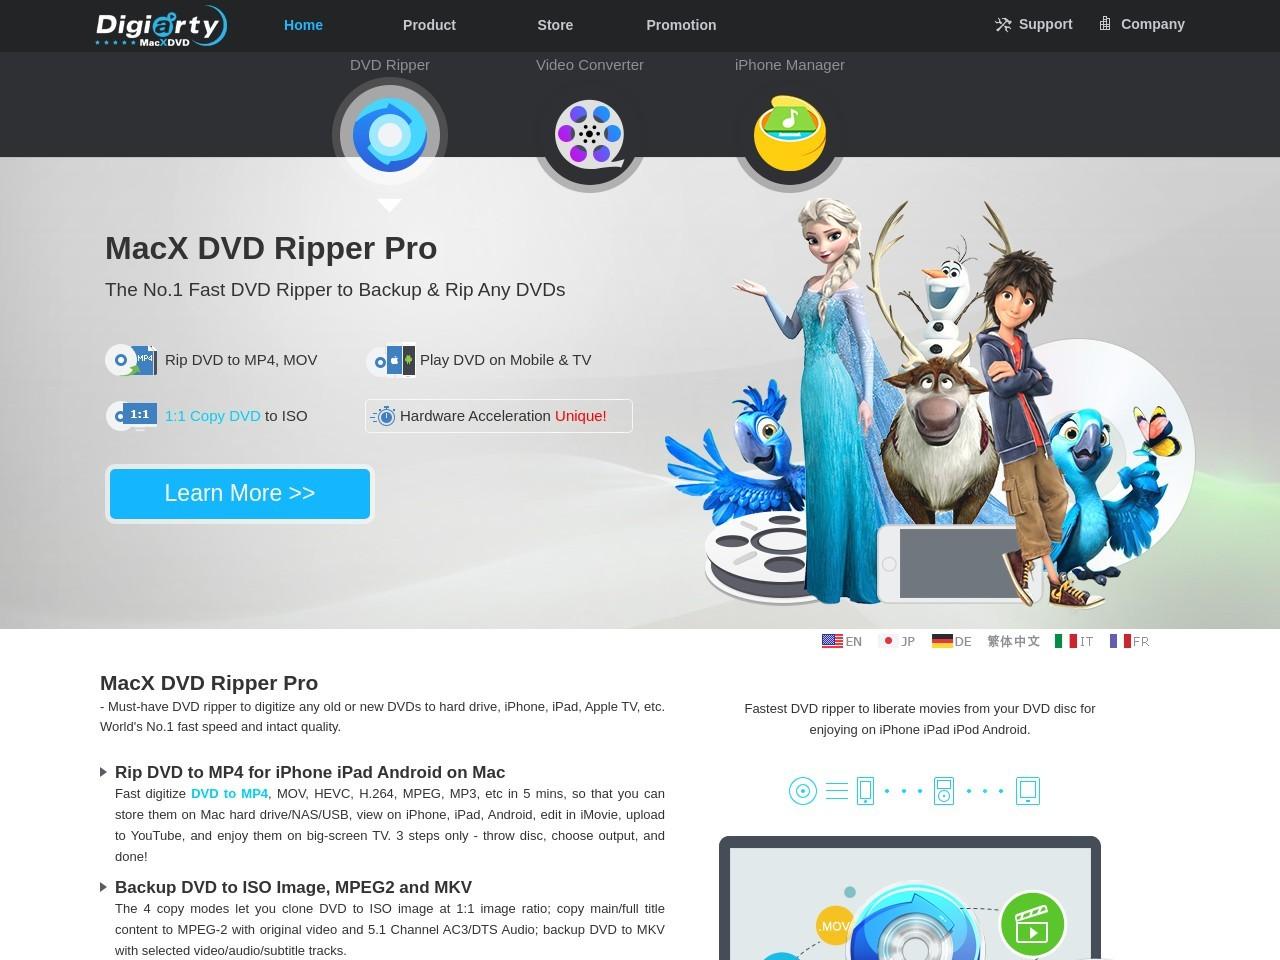 MacX Video Converter Pro (1 Year License)